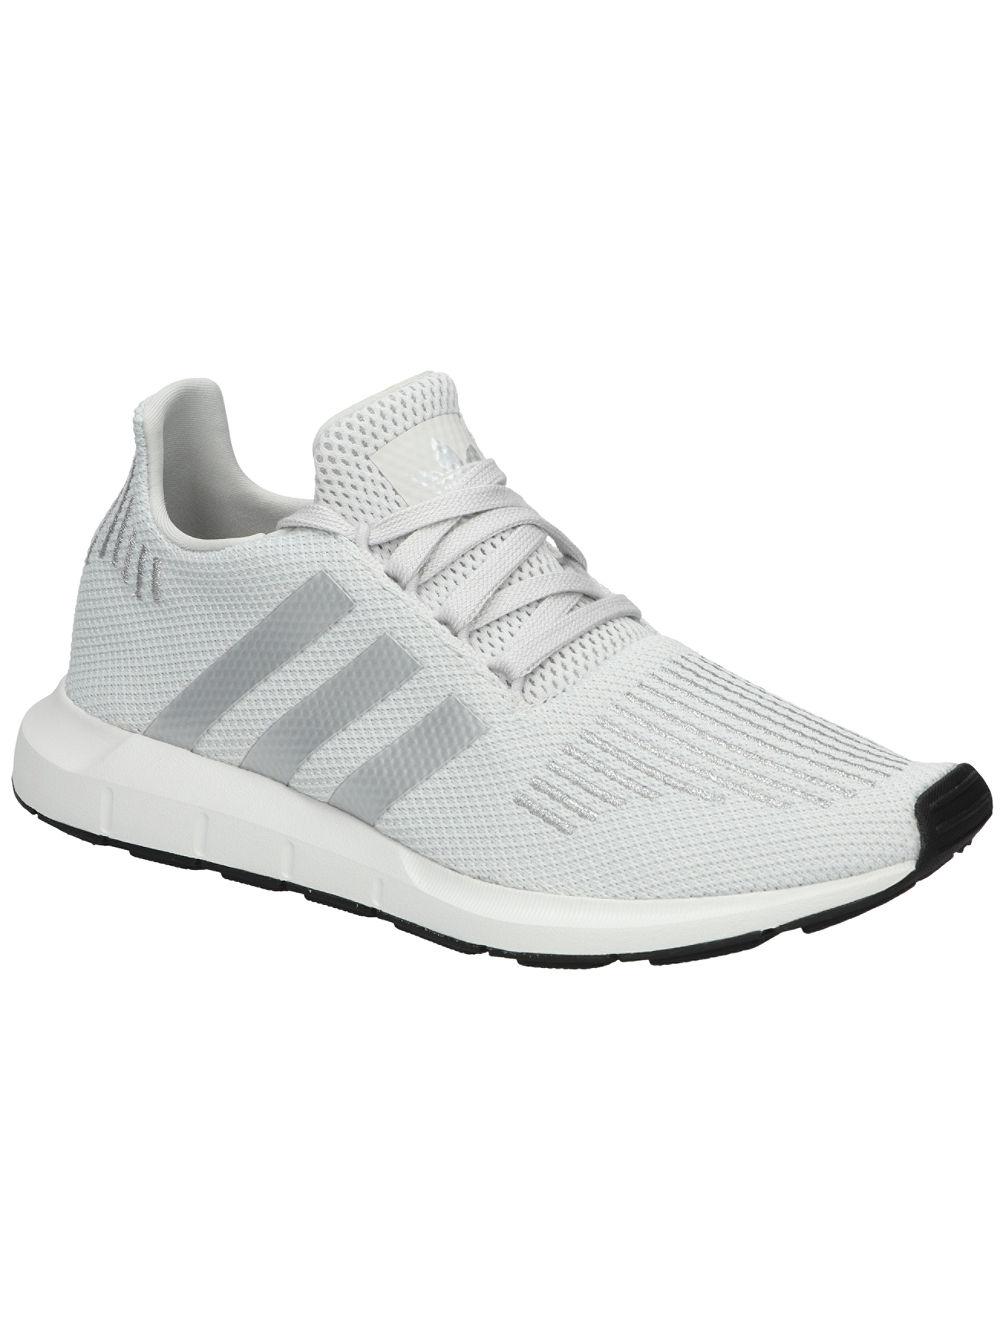 Buy Adidas Originals Swift Run W Sneakers Women Online At